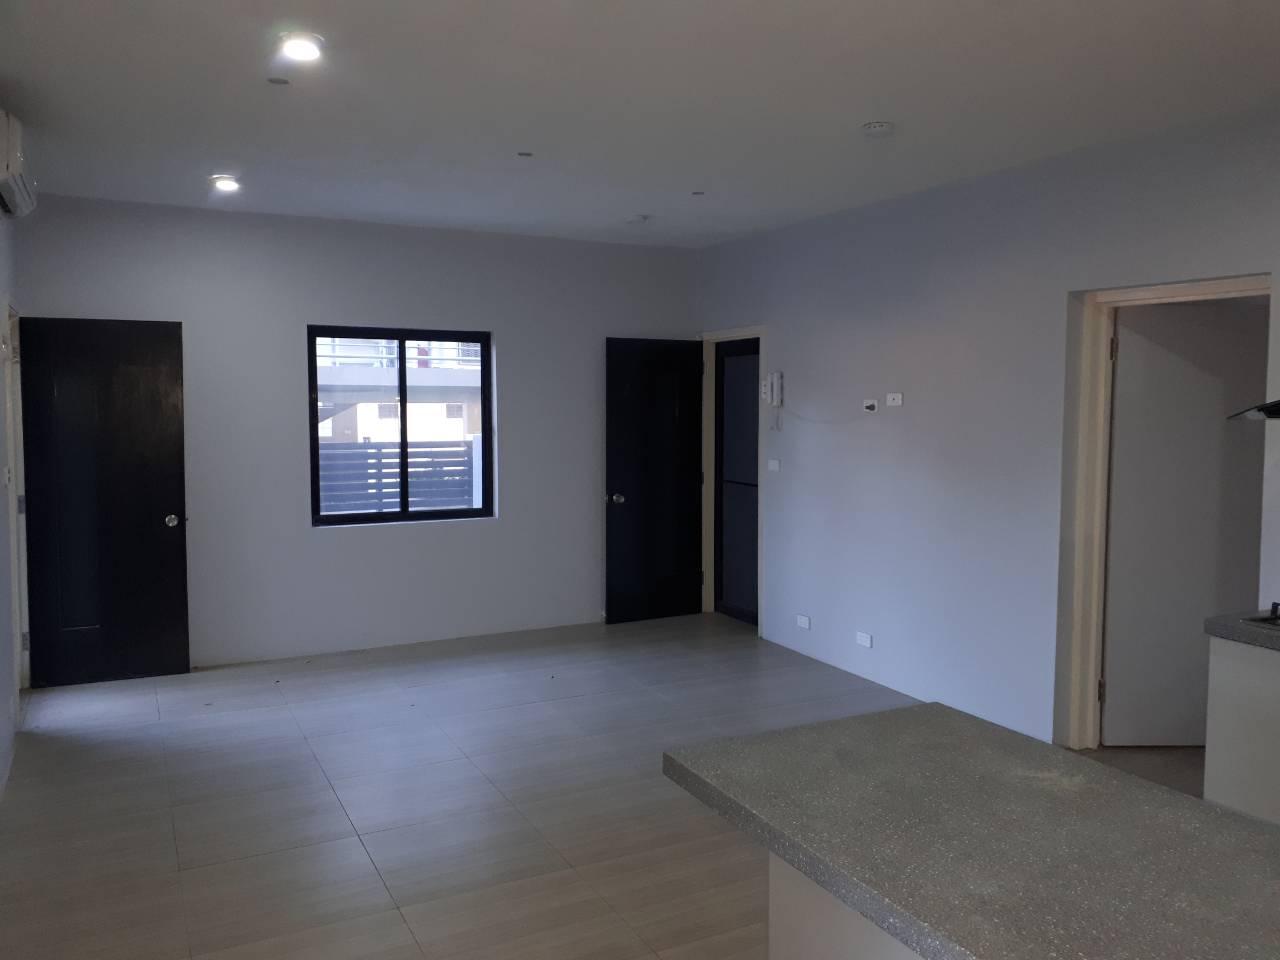 Flat for rent in Nadi ID 11845   Property com fj